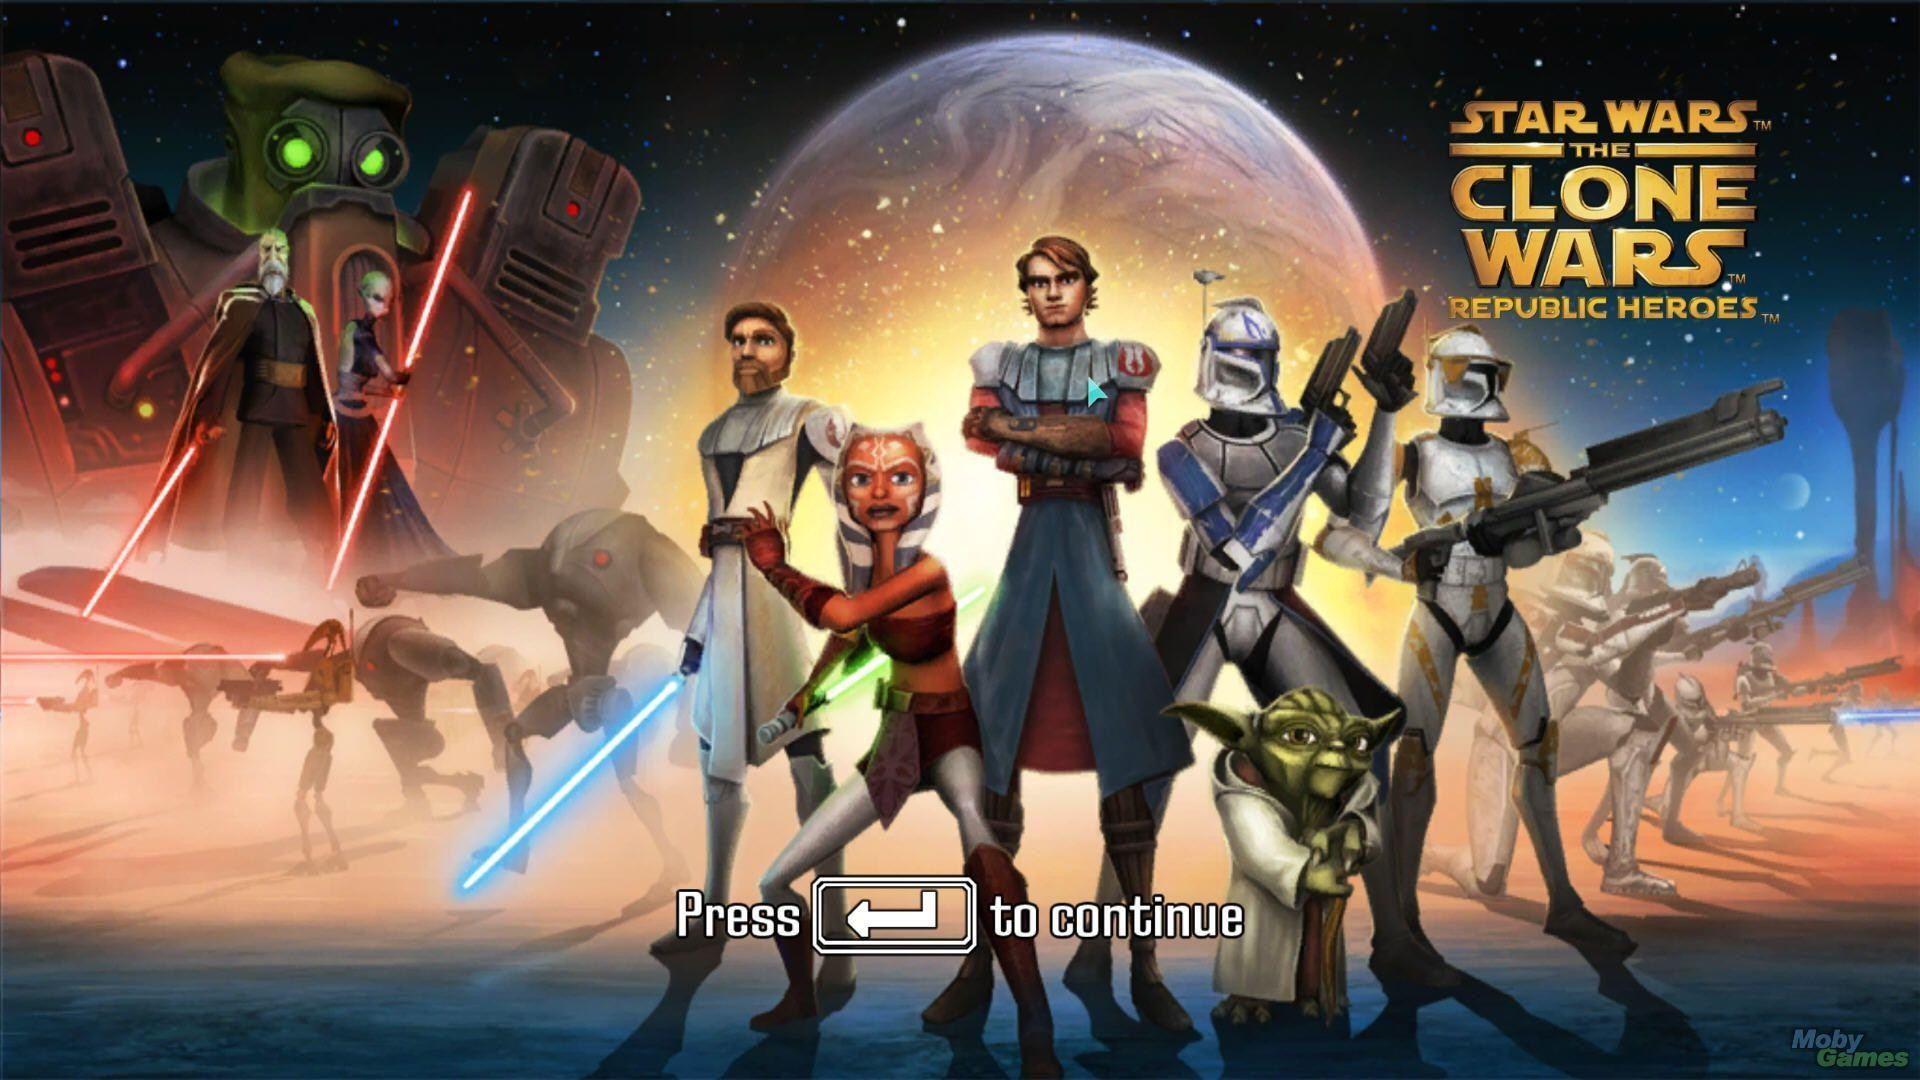 Star Wars The Clone Wars Wallpaper 4k 2423372 Hd Wallpaper Backgrounds Download